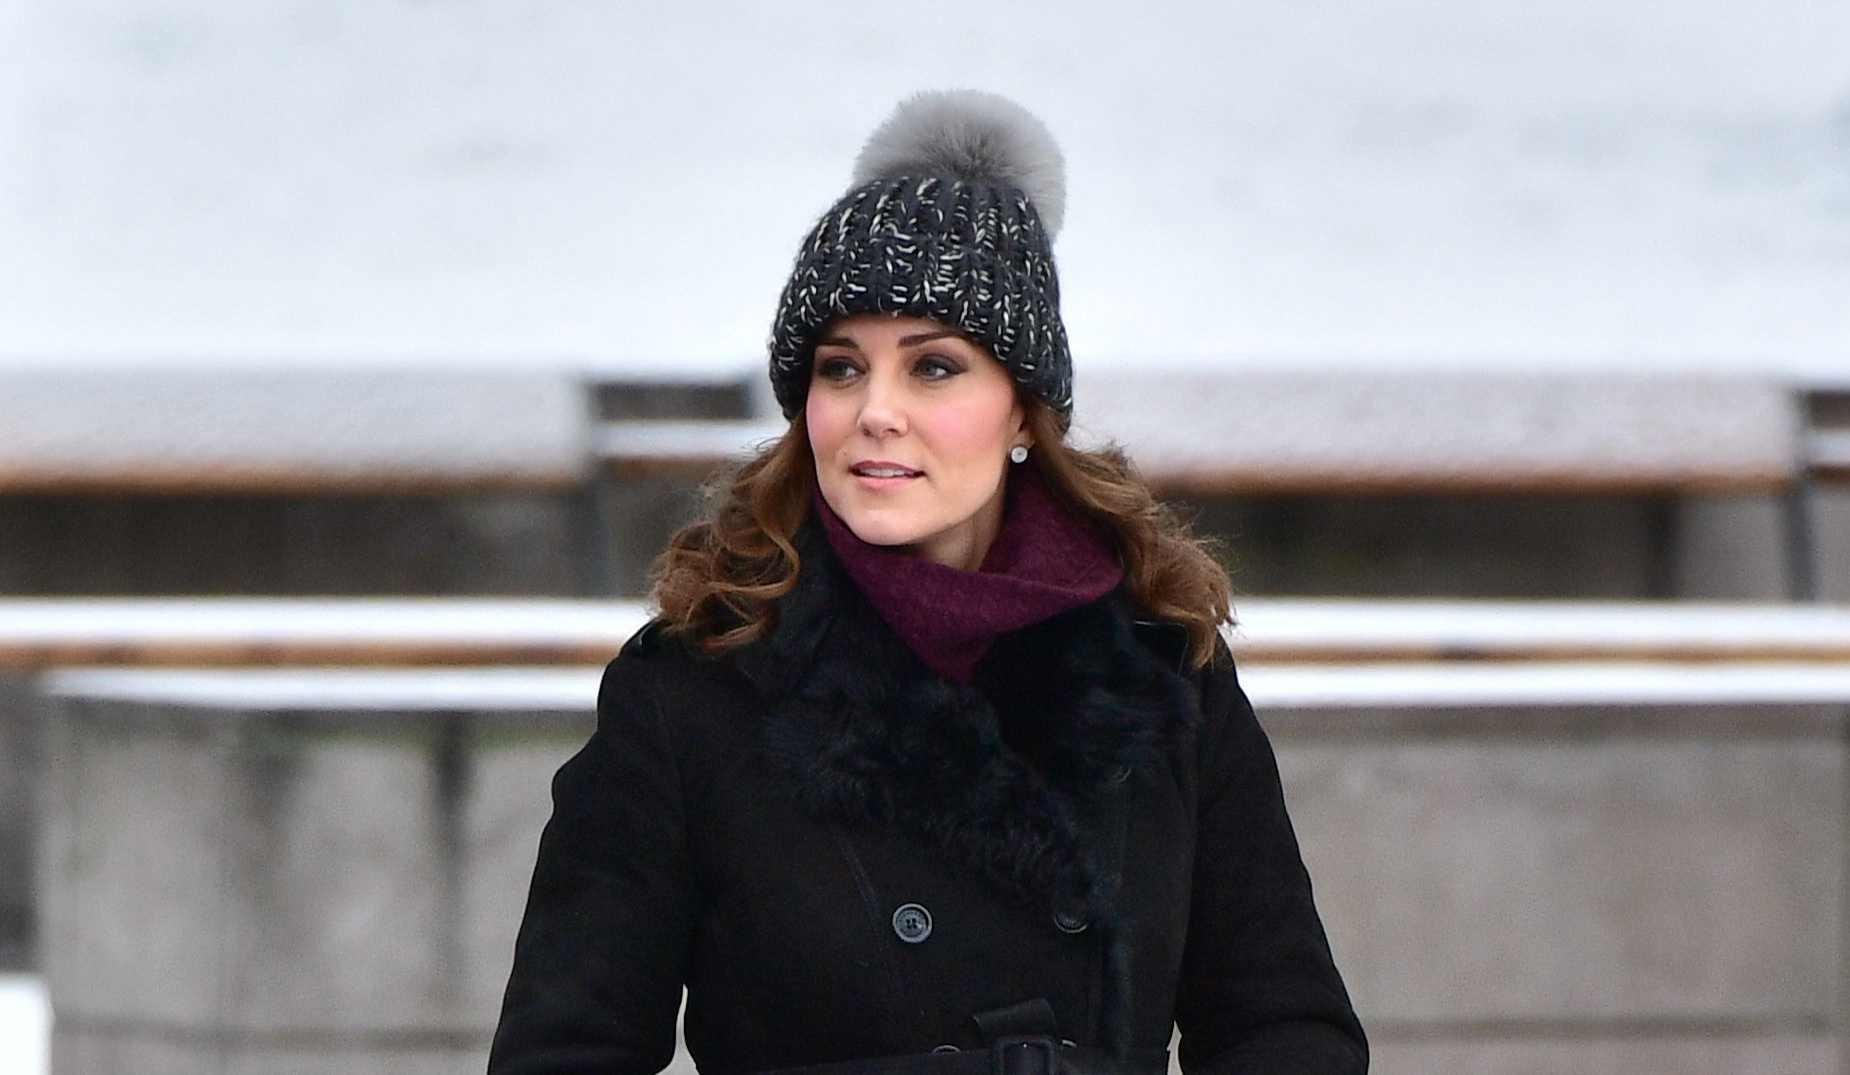 5dfa109e5f04d The Duchess of Cambridge sporting a bobble hat in Stockholm in January  (Dominic Lipinski PA)